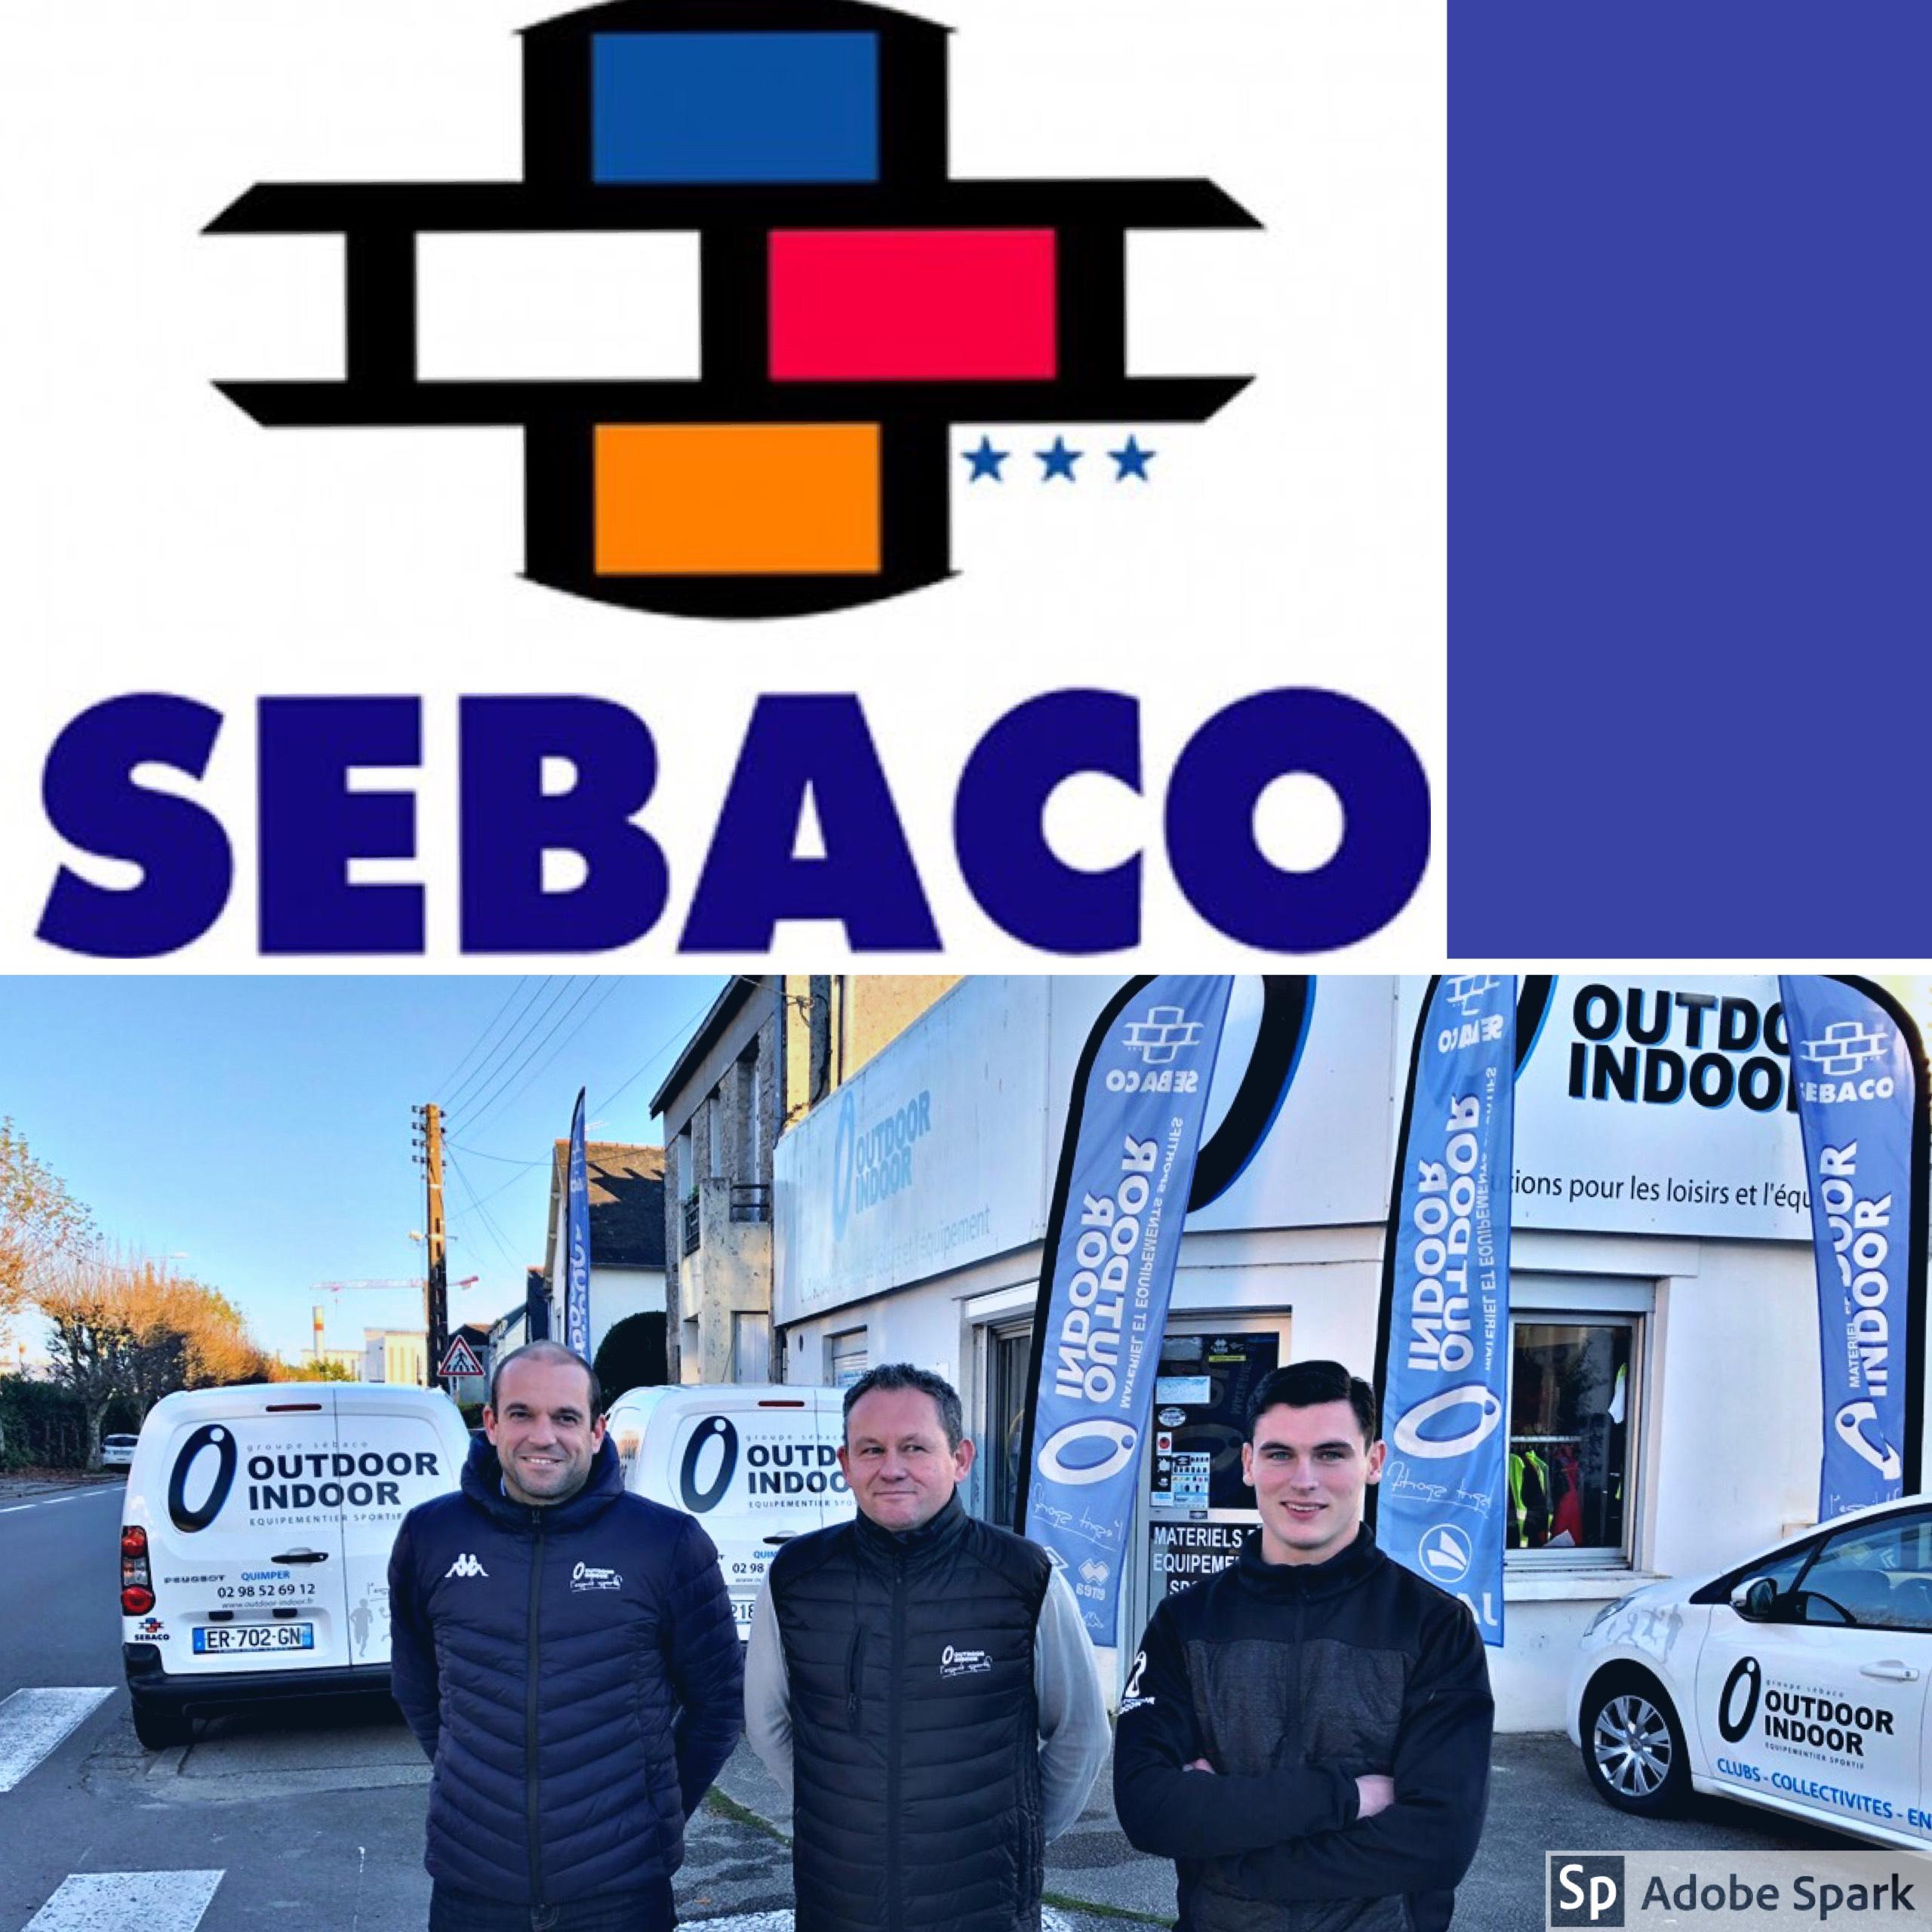 Interview Sebaco/Outdoor-Indoor, sponsor historique de l'EQHB !